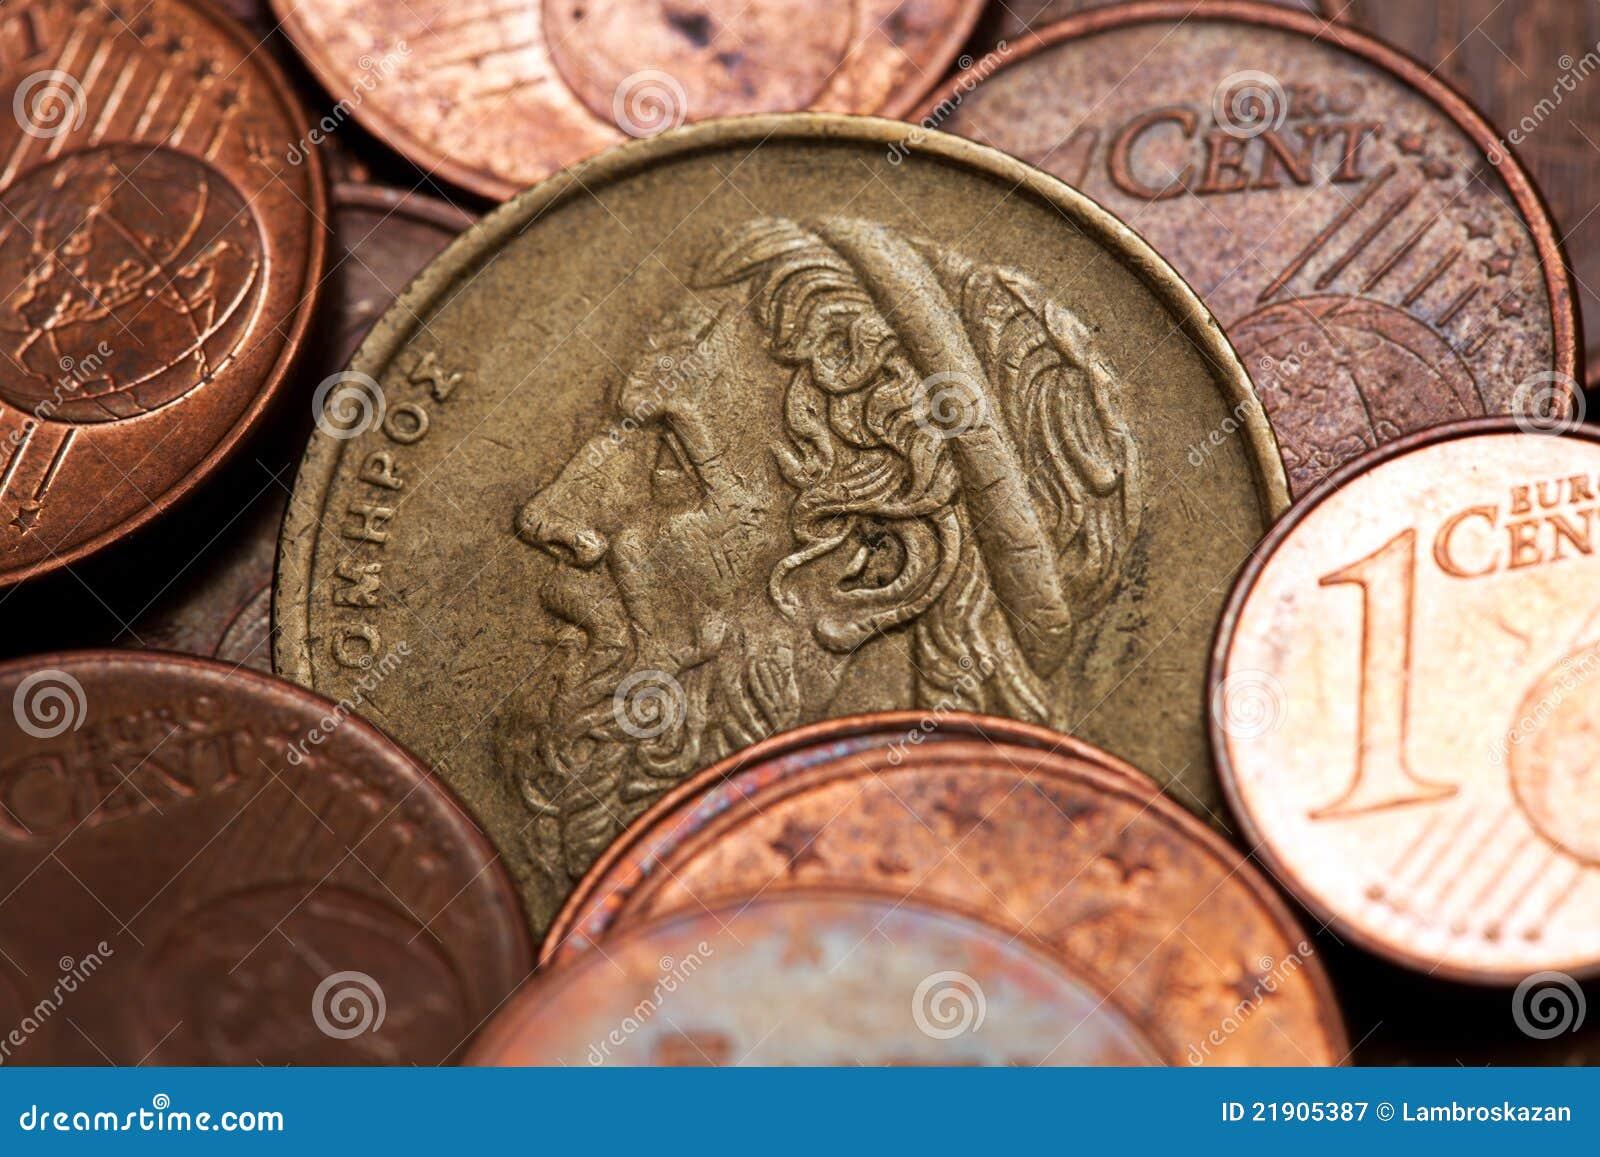 Greek 50 Drachmas Coin Among Euro Coins Stock Image Image Of Metal Historic 21905387